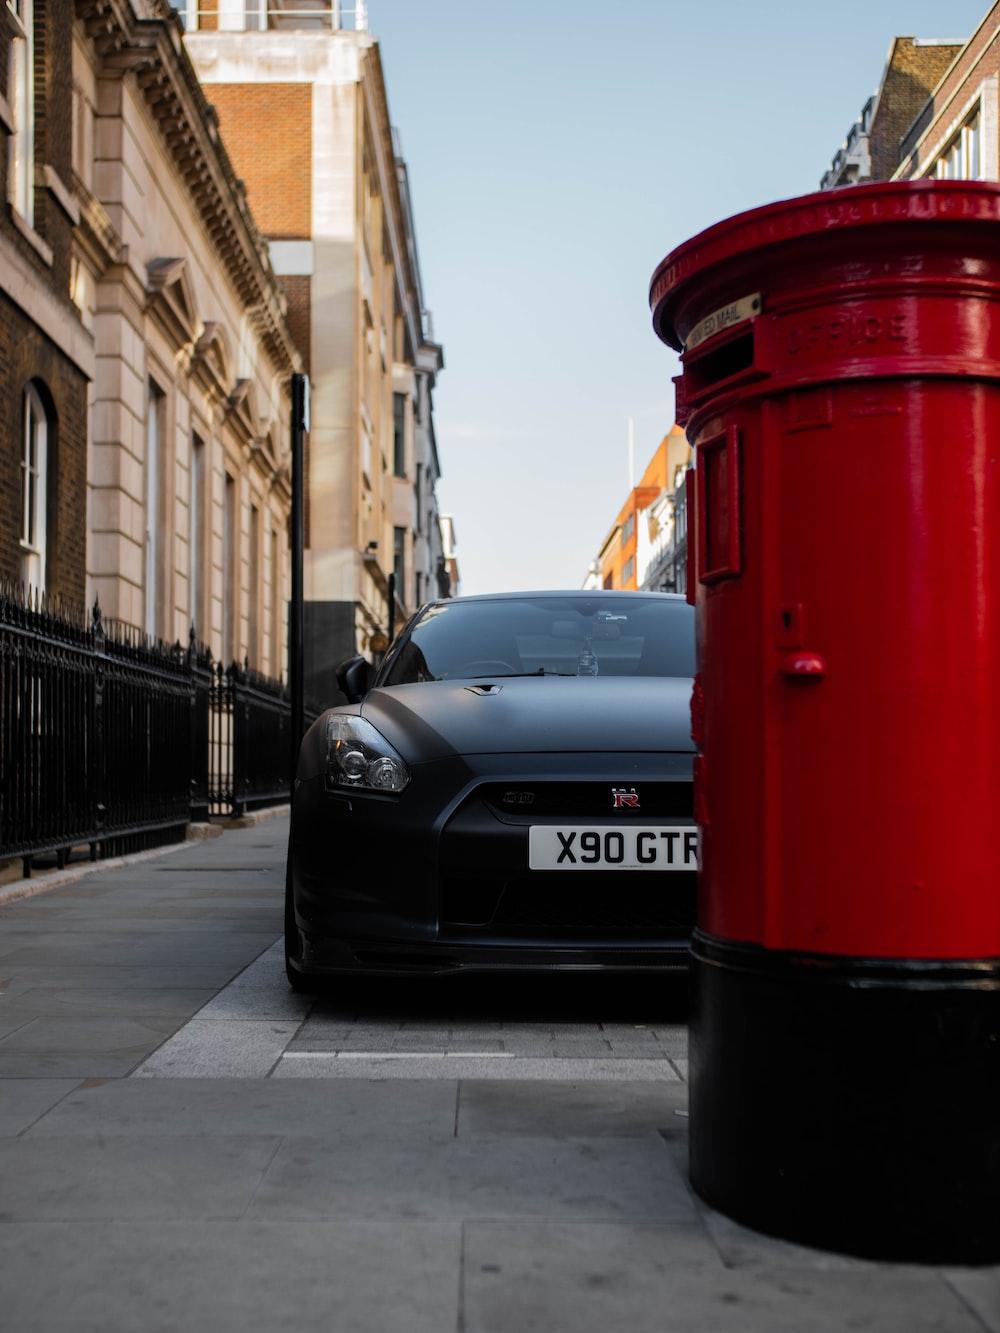 Muriwai Mailboxes Photo By Mathyas Kurmann Mathyaskurmann On Unsplash Moto Mirror Switch Wiring Diagram Red And Black Car